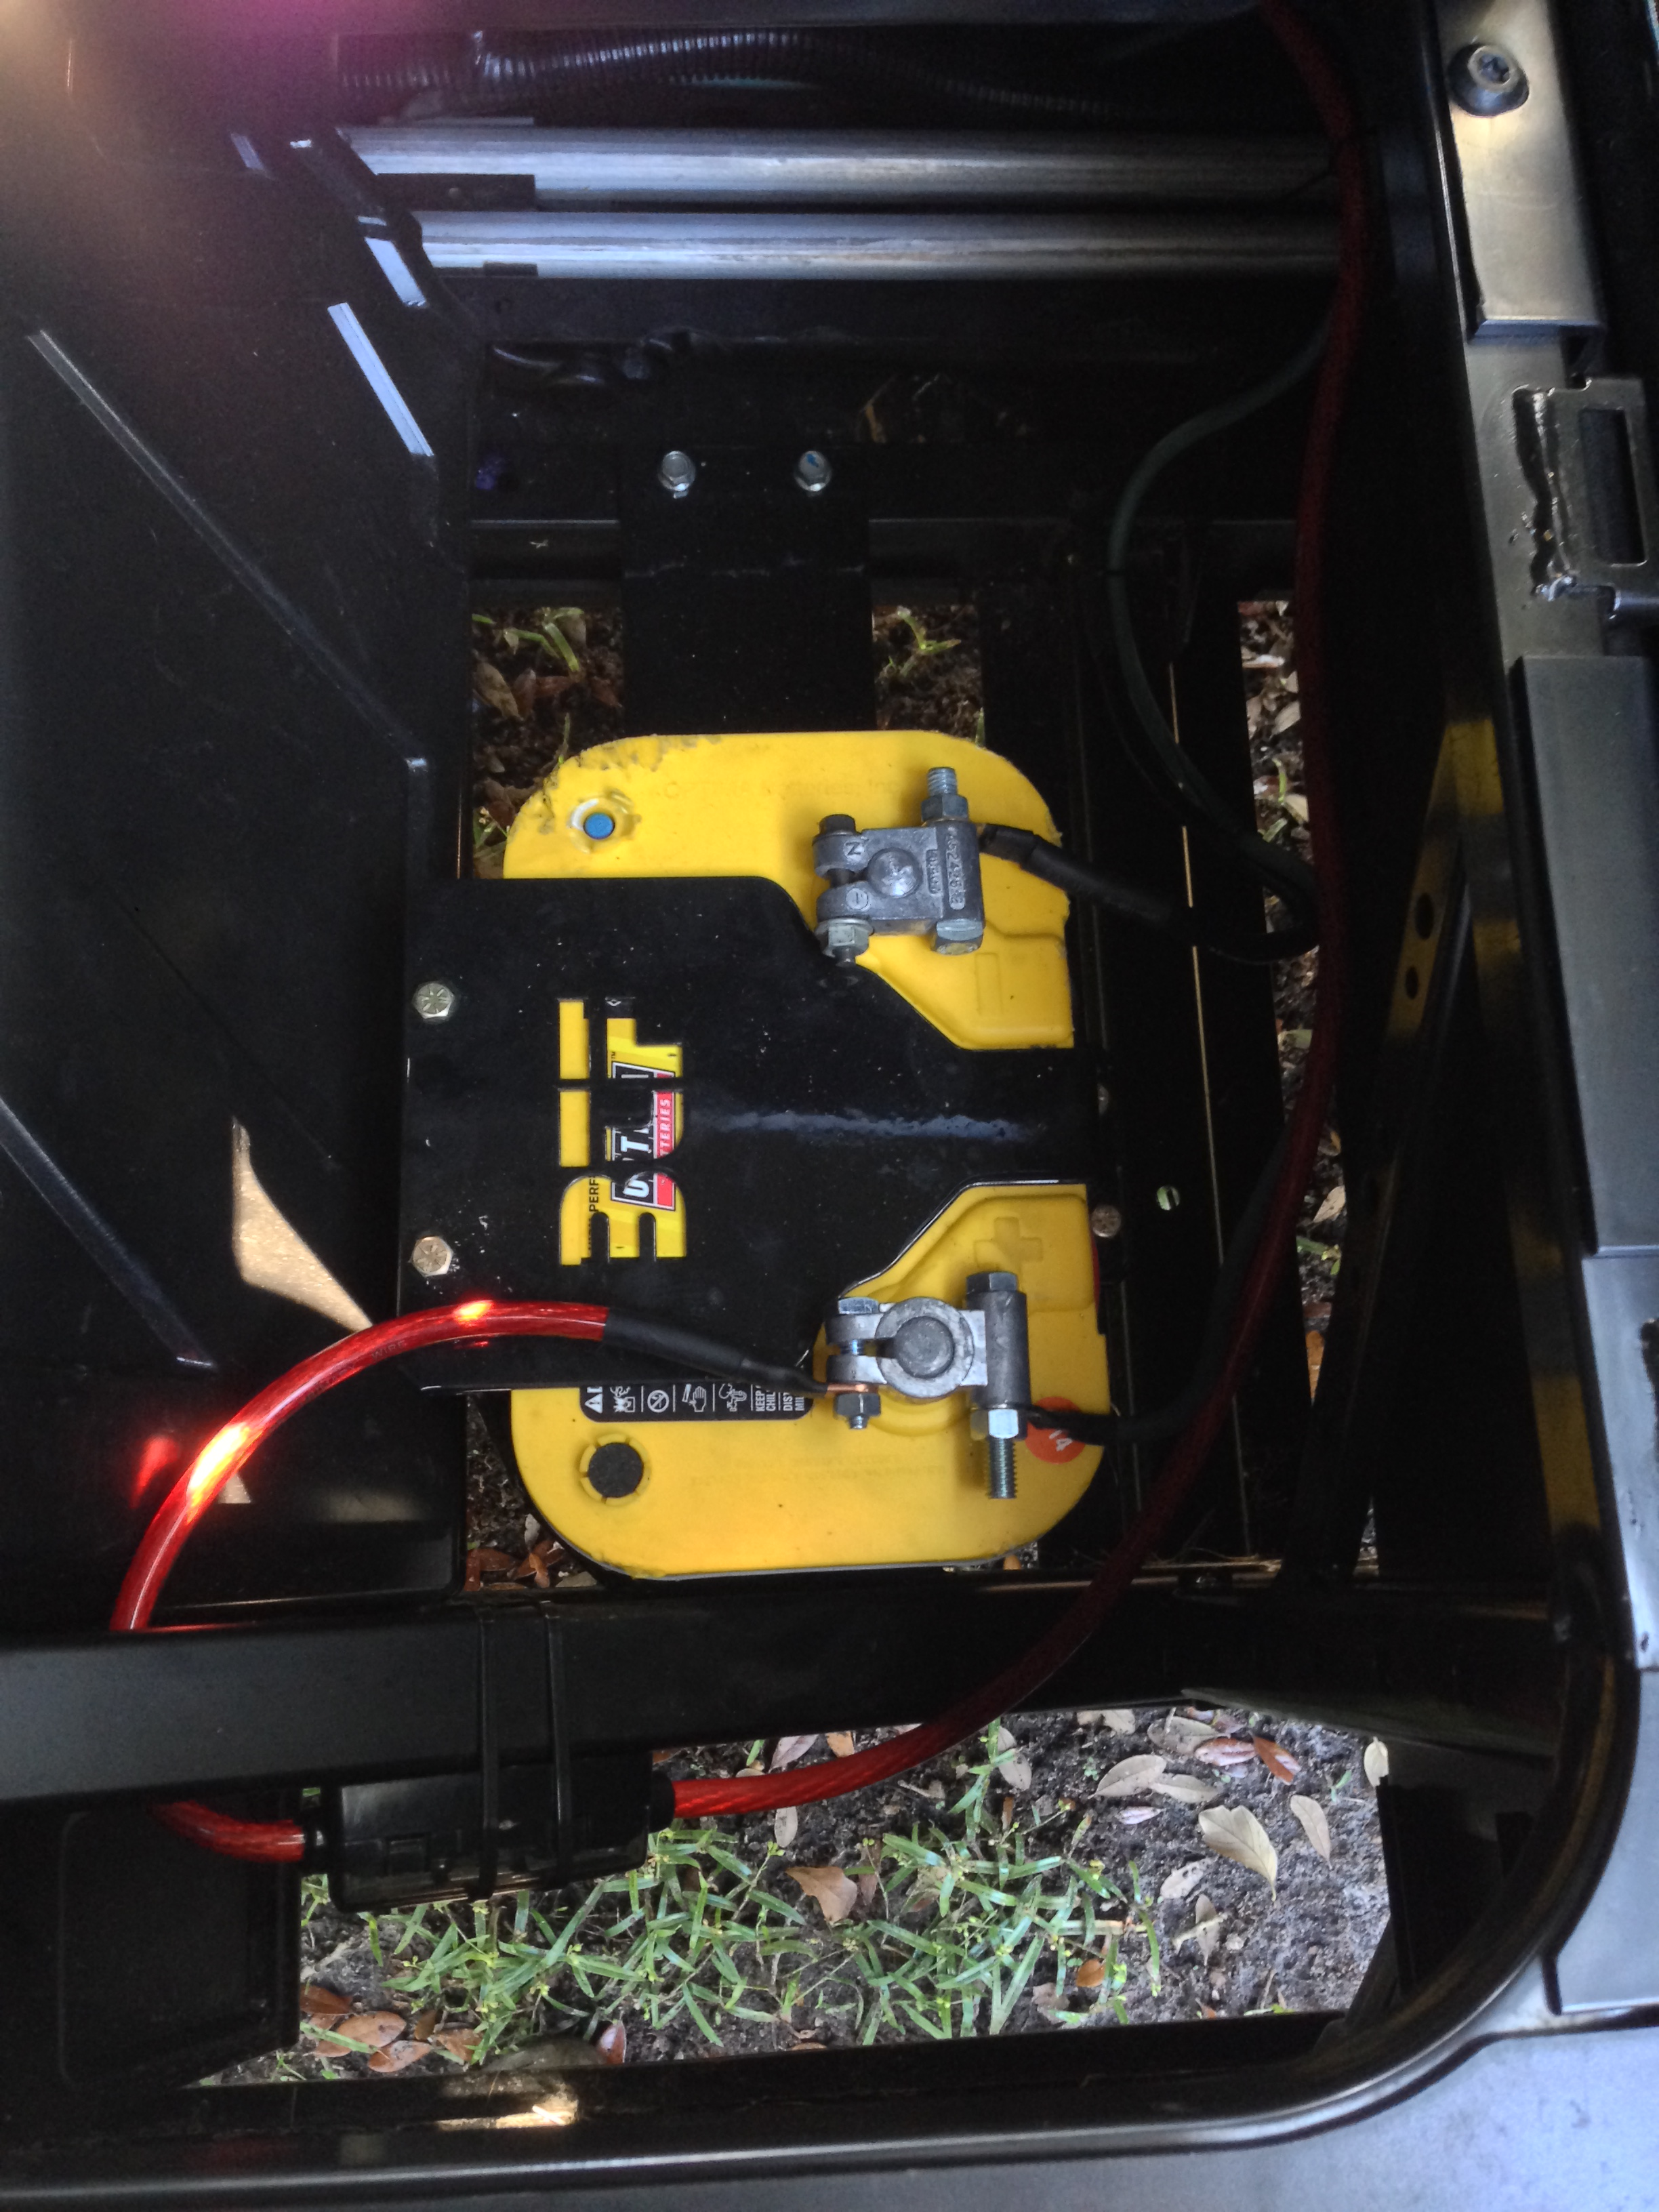 rzr 570 fuse box